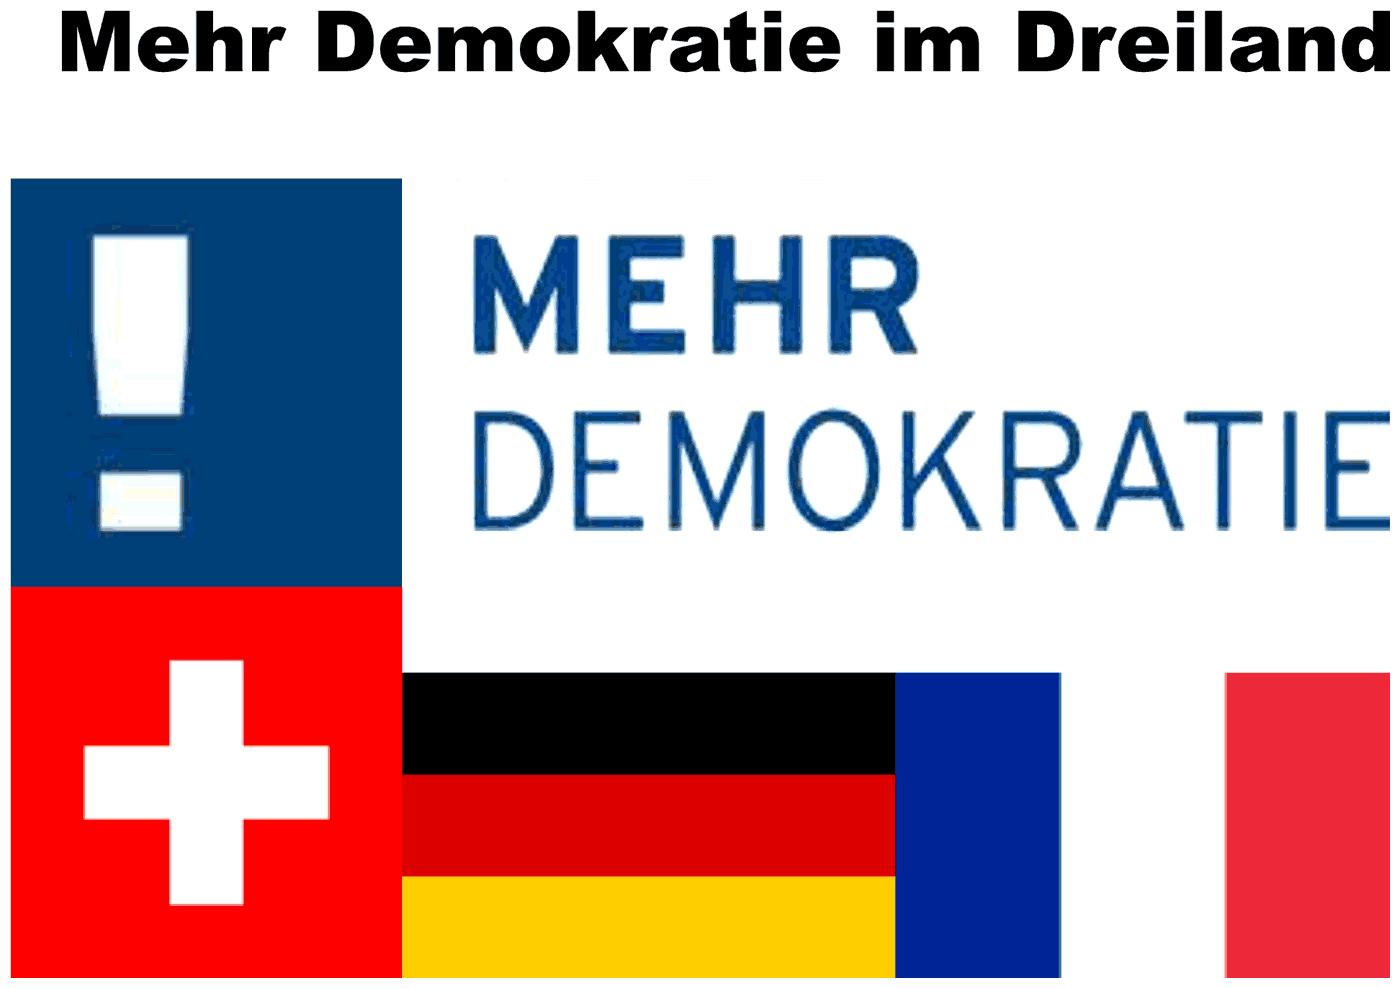 Mehr Demokratie